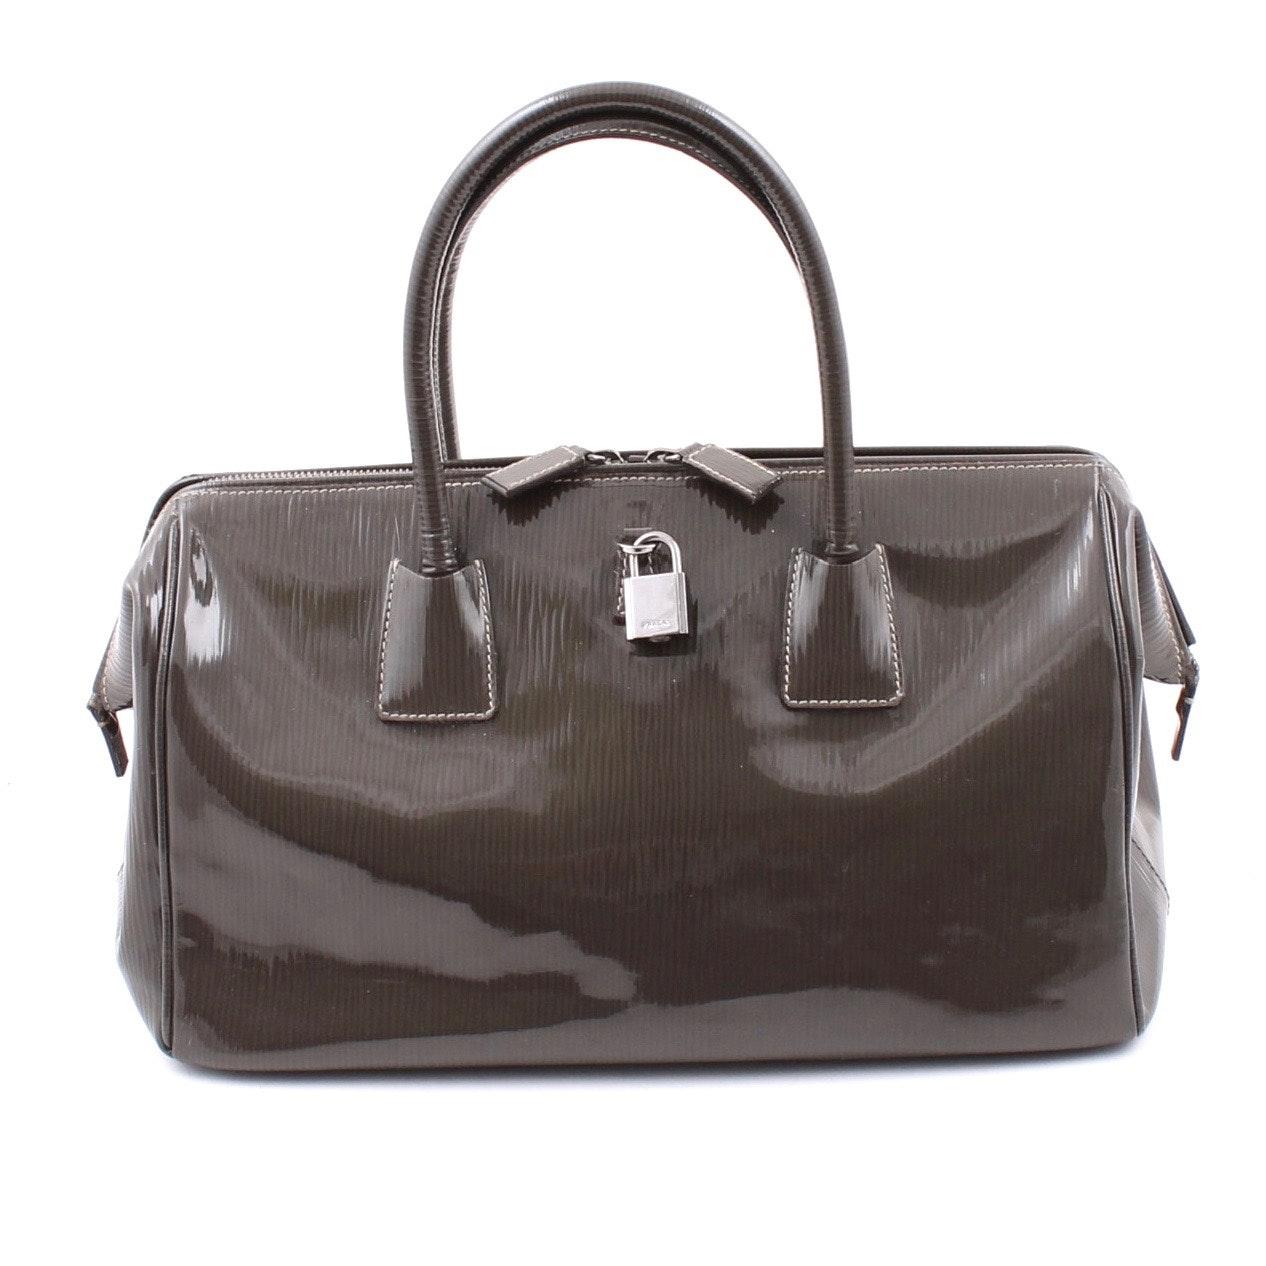 Prada Smoke Grey Patent Leather Handbag